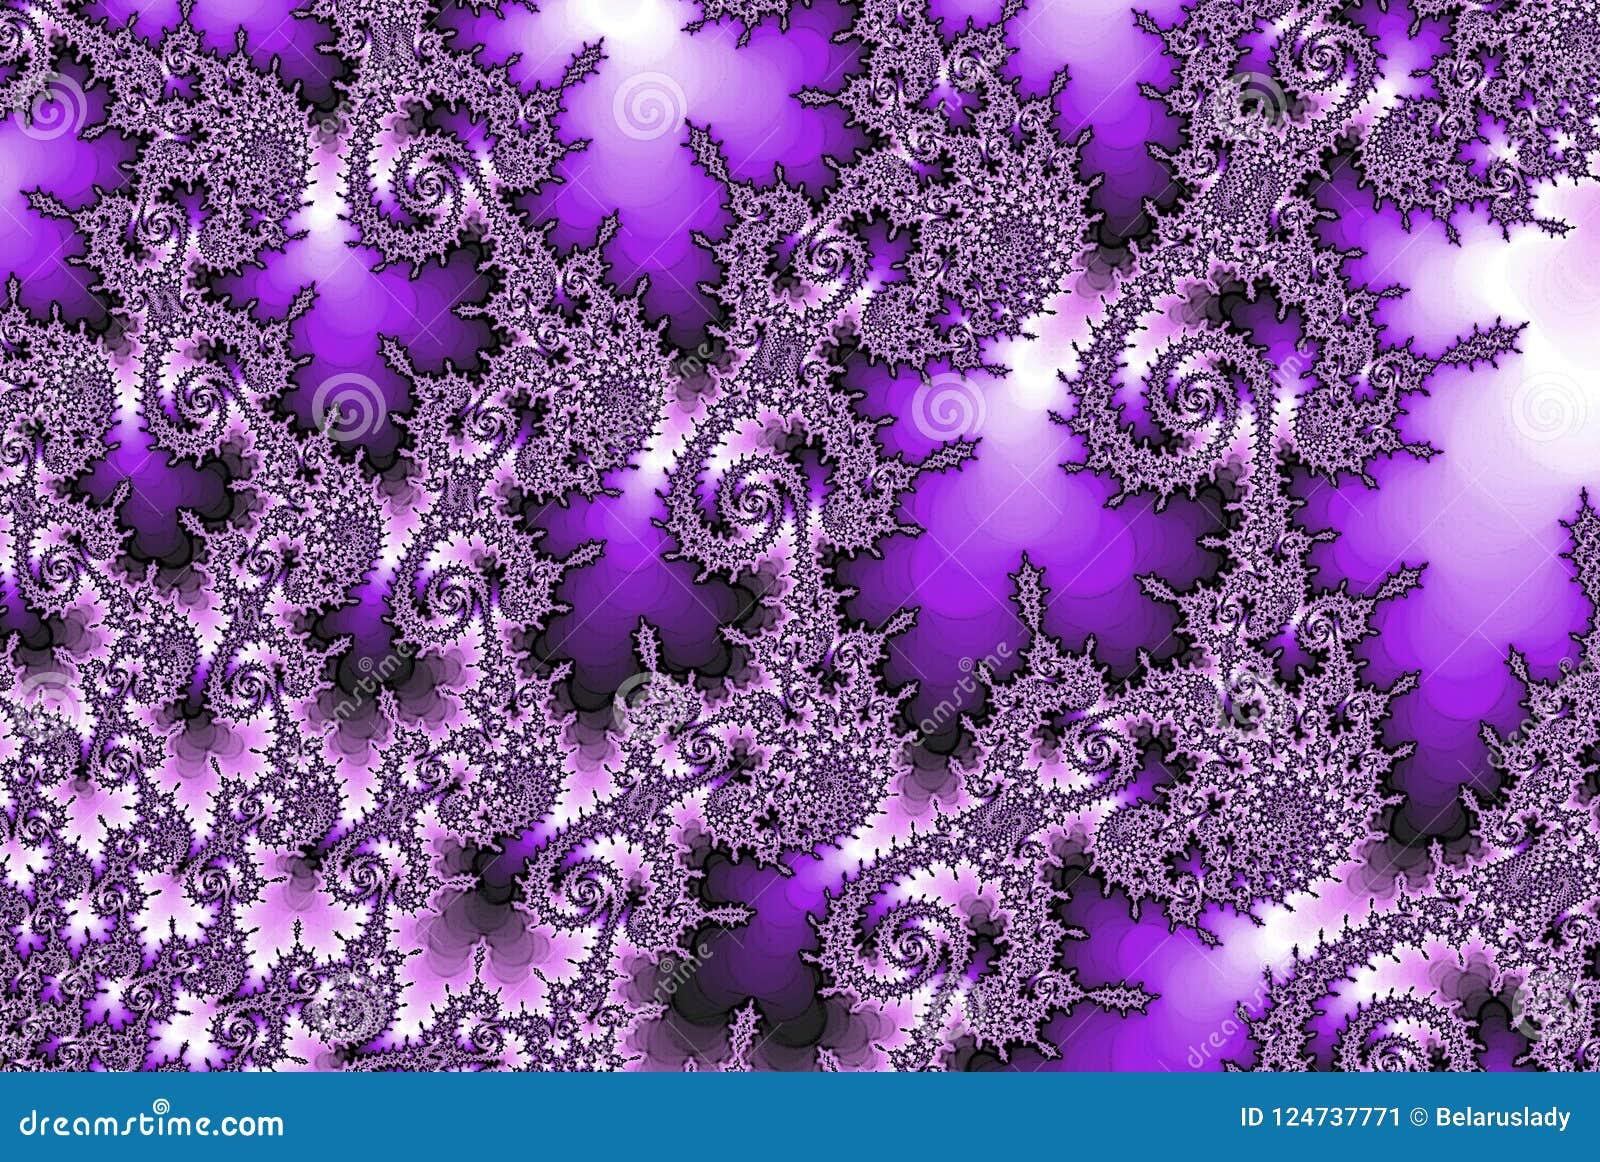 Elegant Fractal Purple Flower Abstract Background Wallpaper Stock